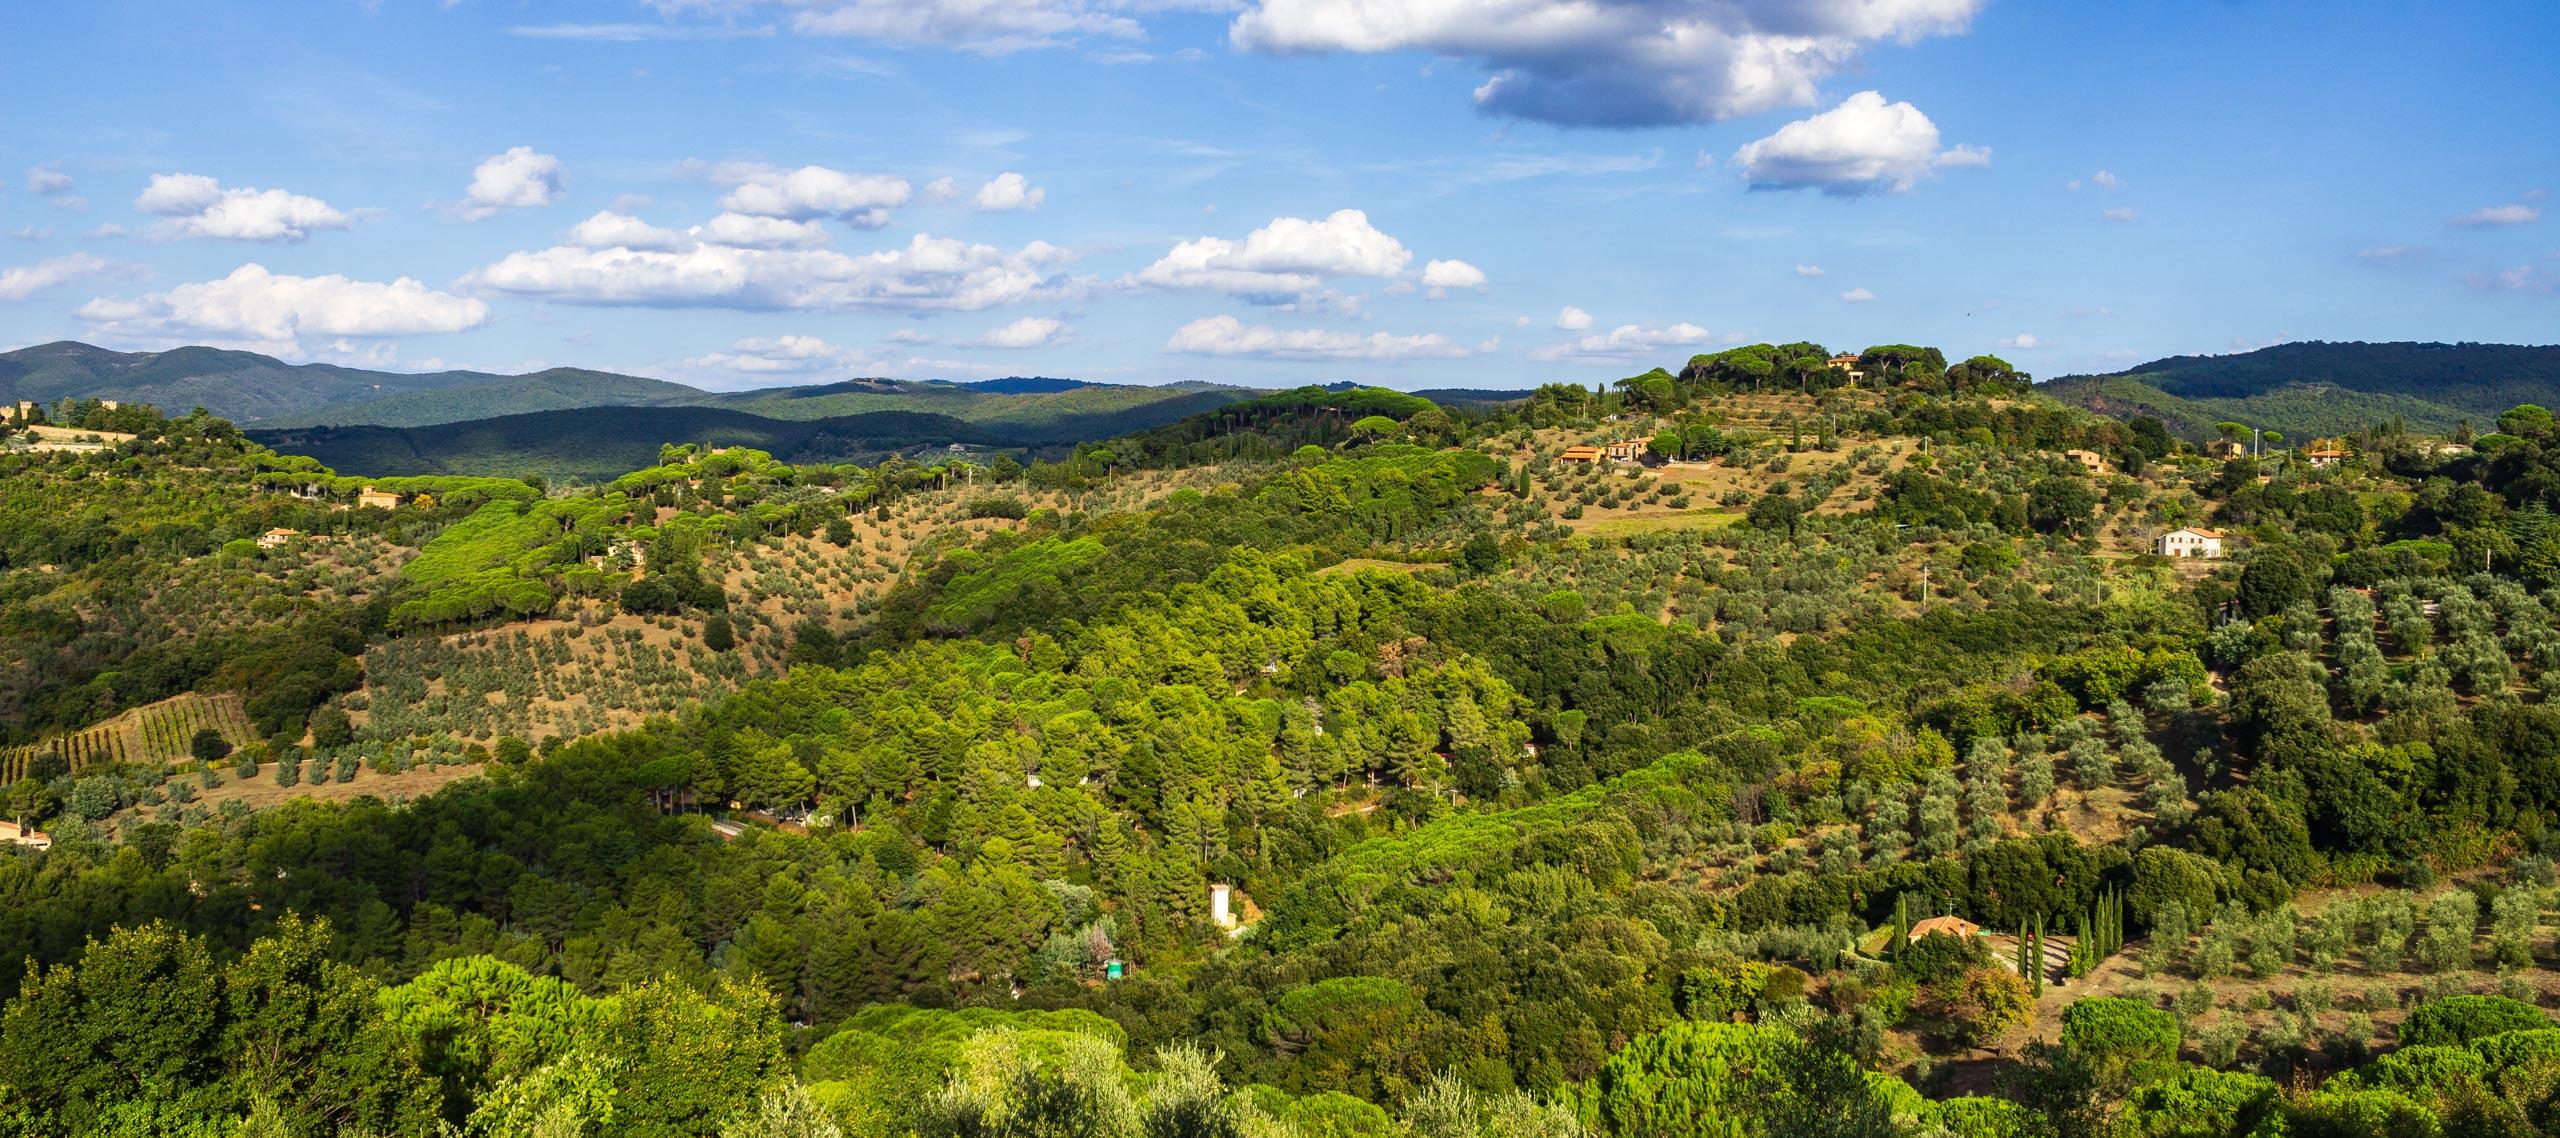 2013 10 Tuscany Panorama 002